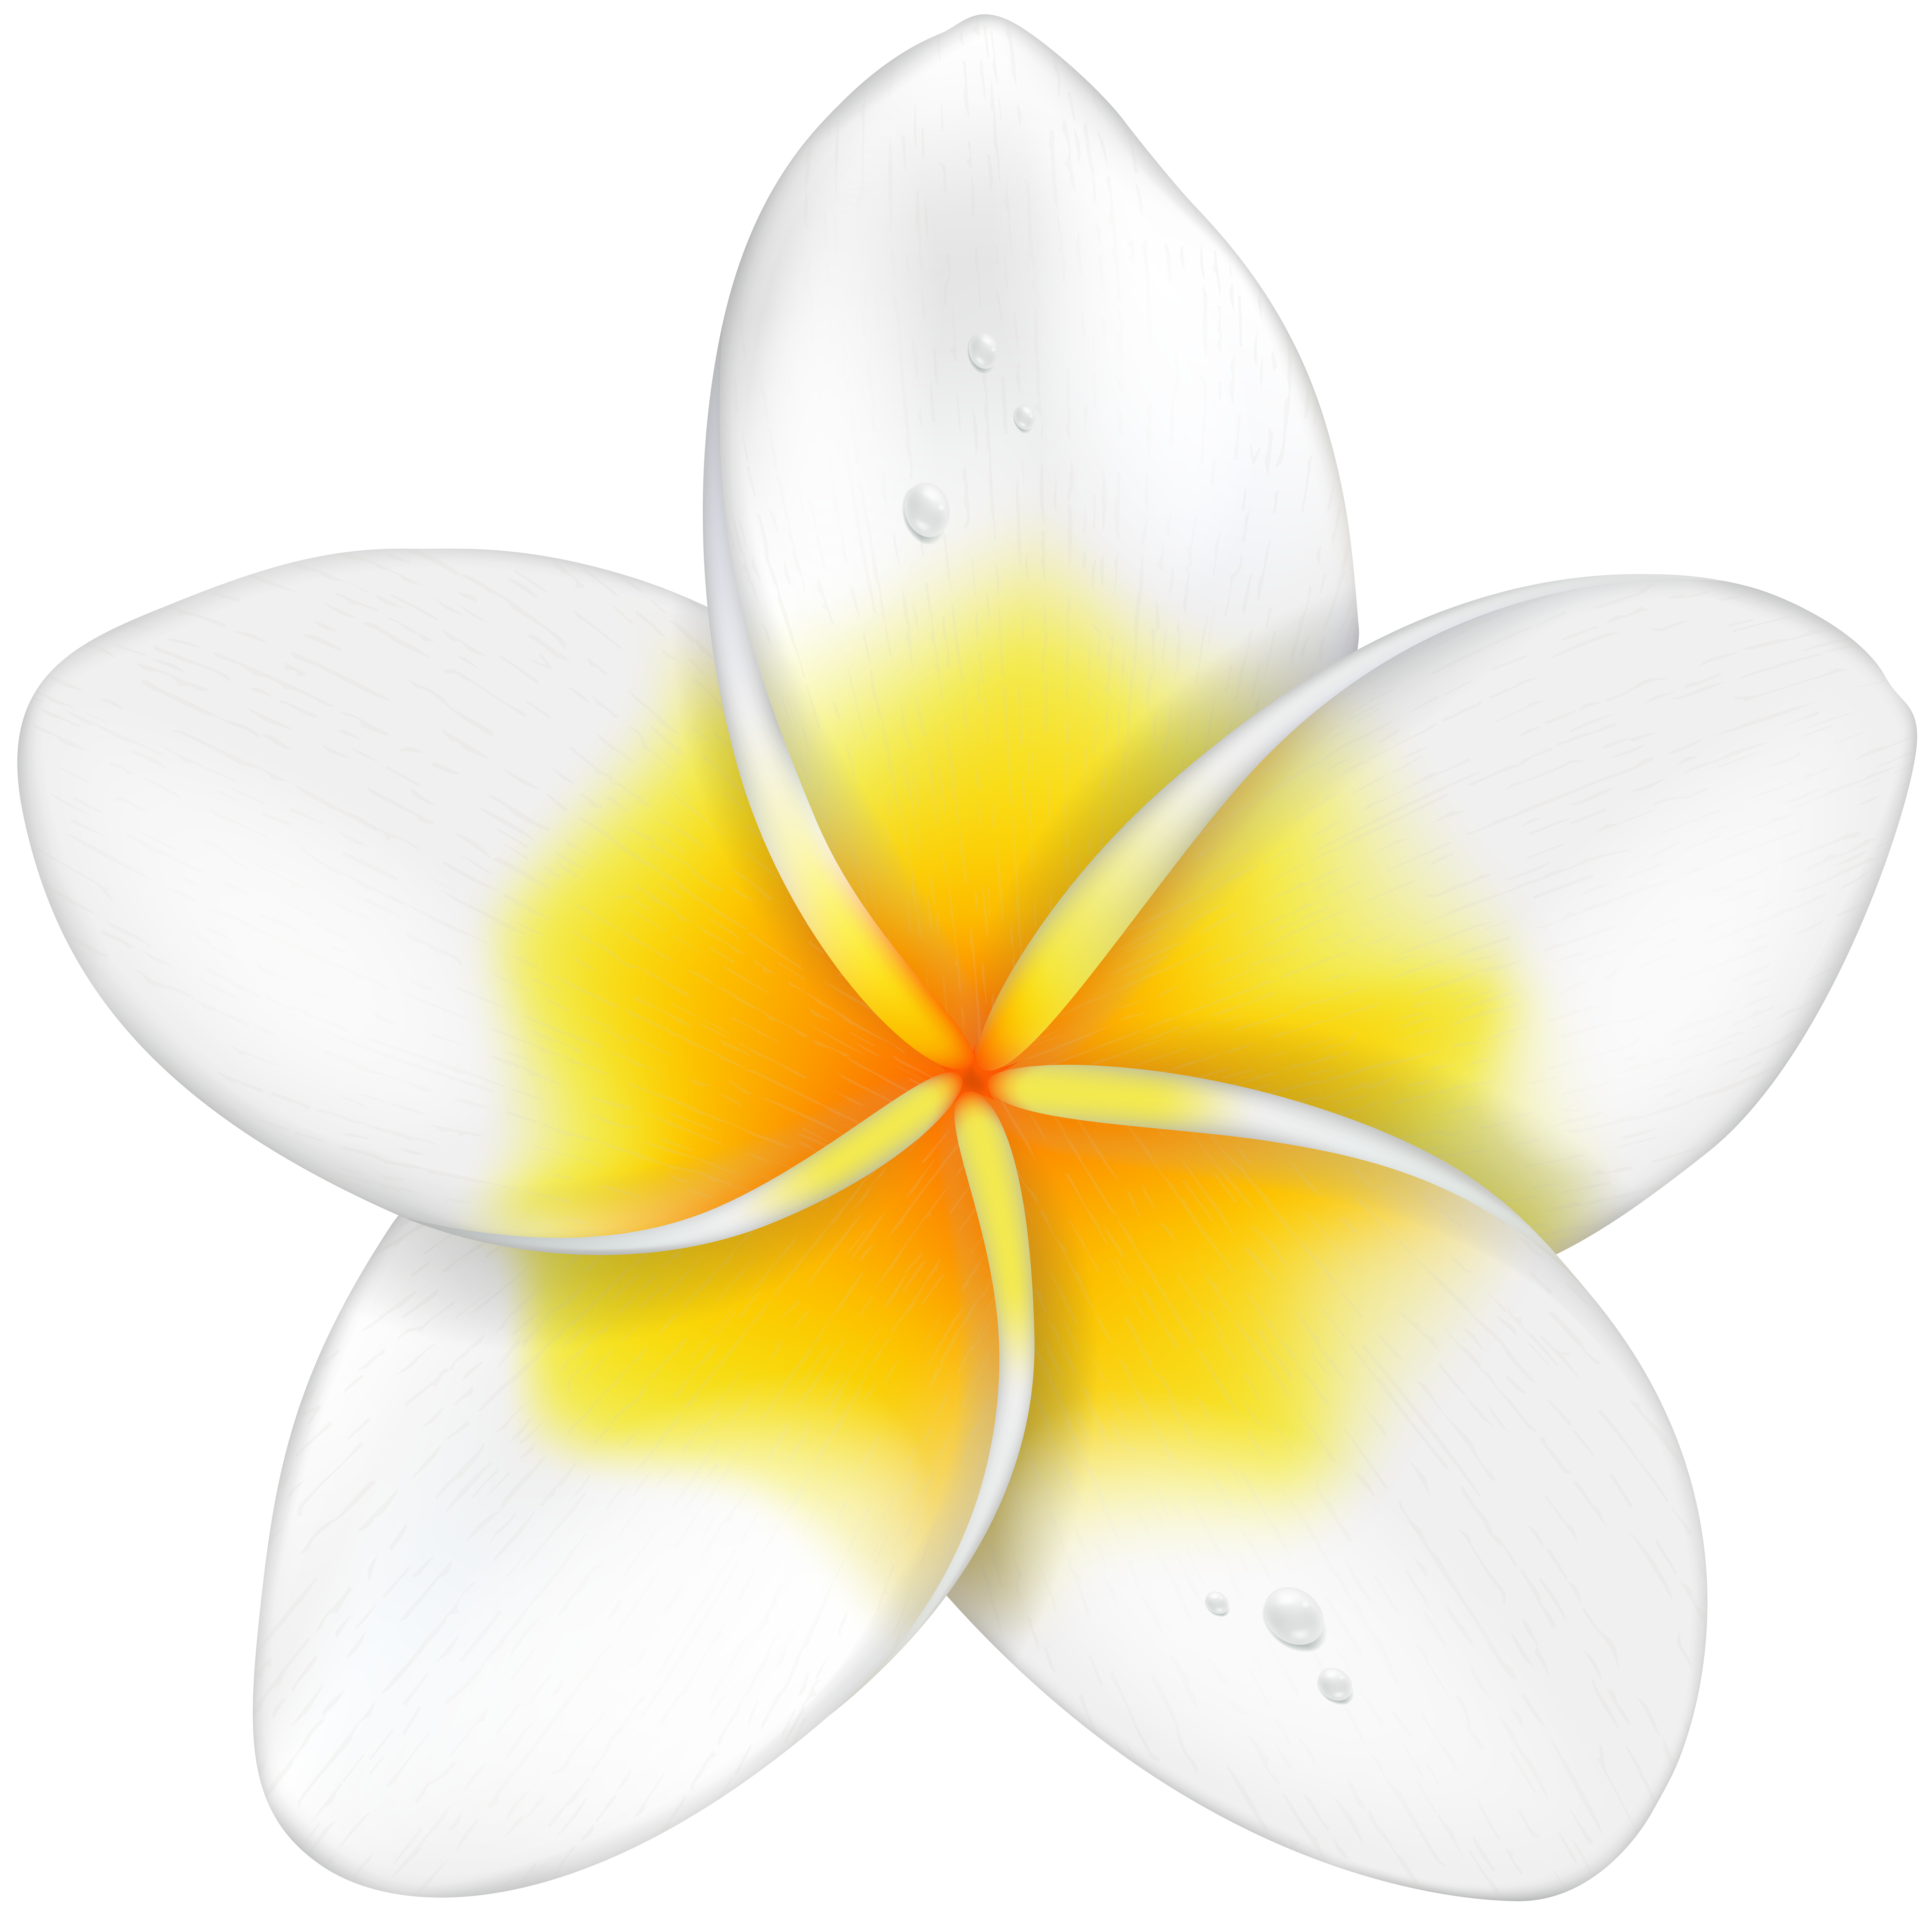 8000x7934 Exotic Flower Plumeria Png Clip Art Imageu200b Gallery Yopriceville